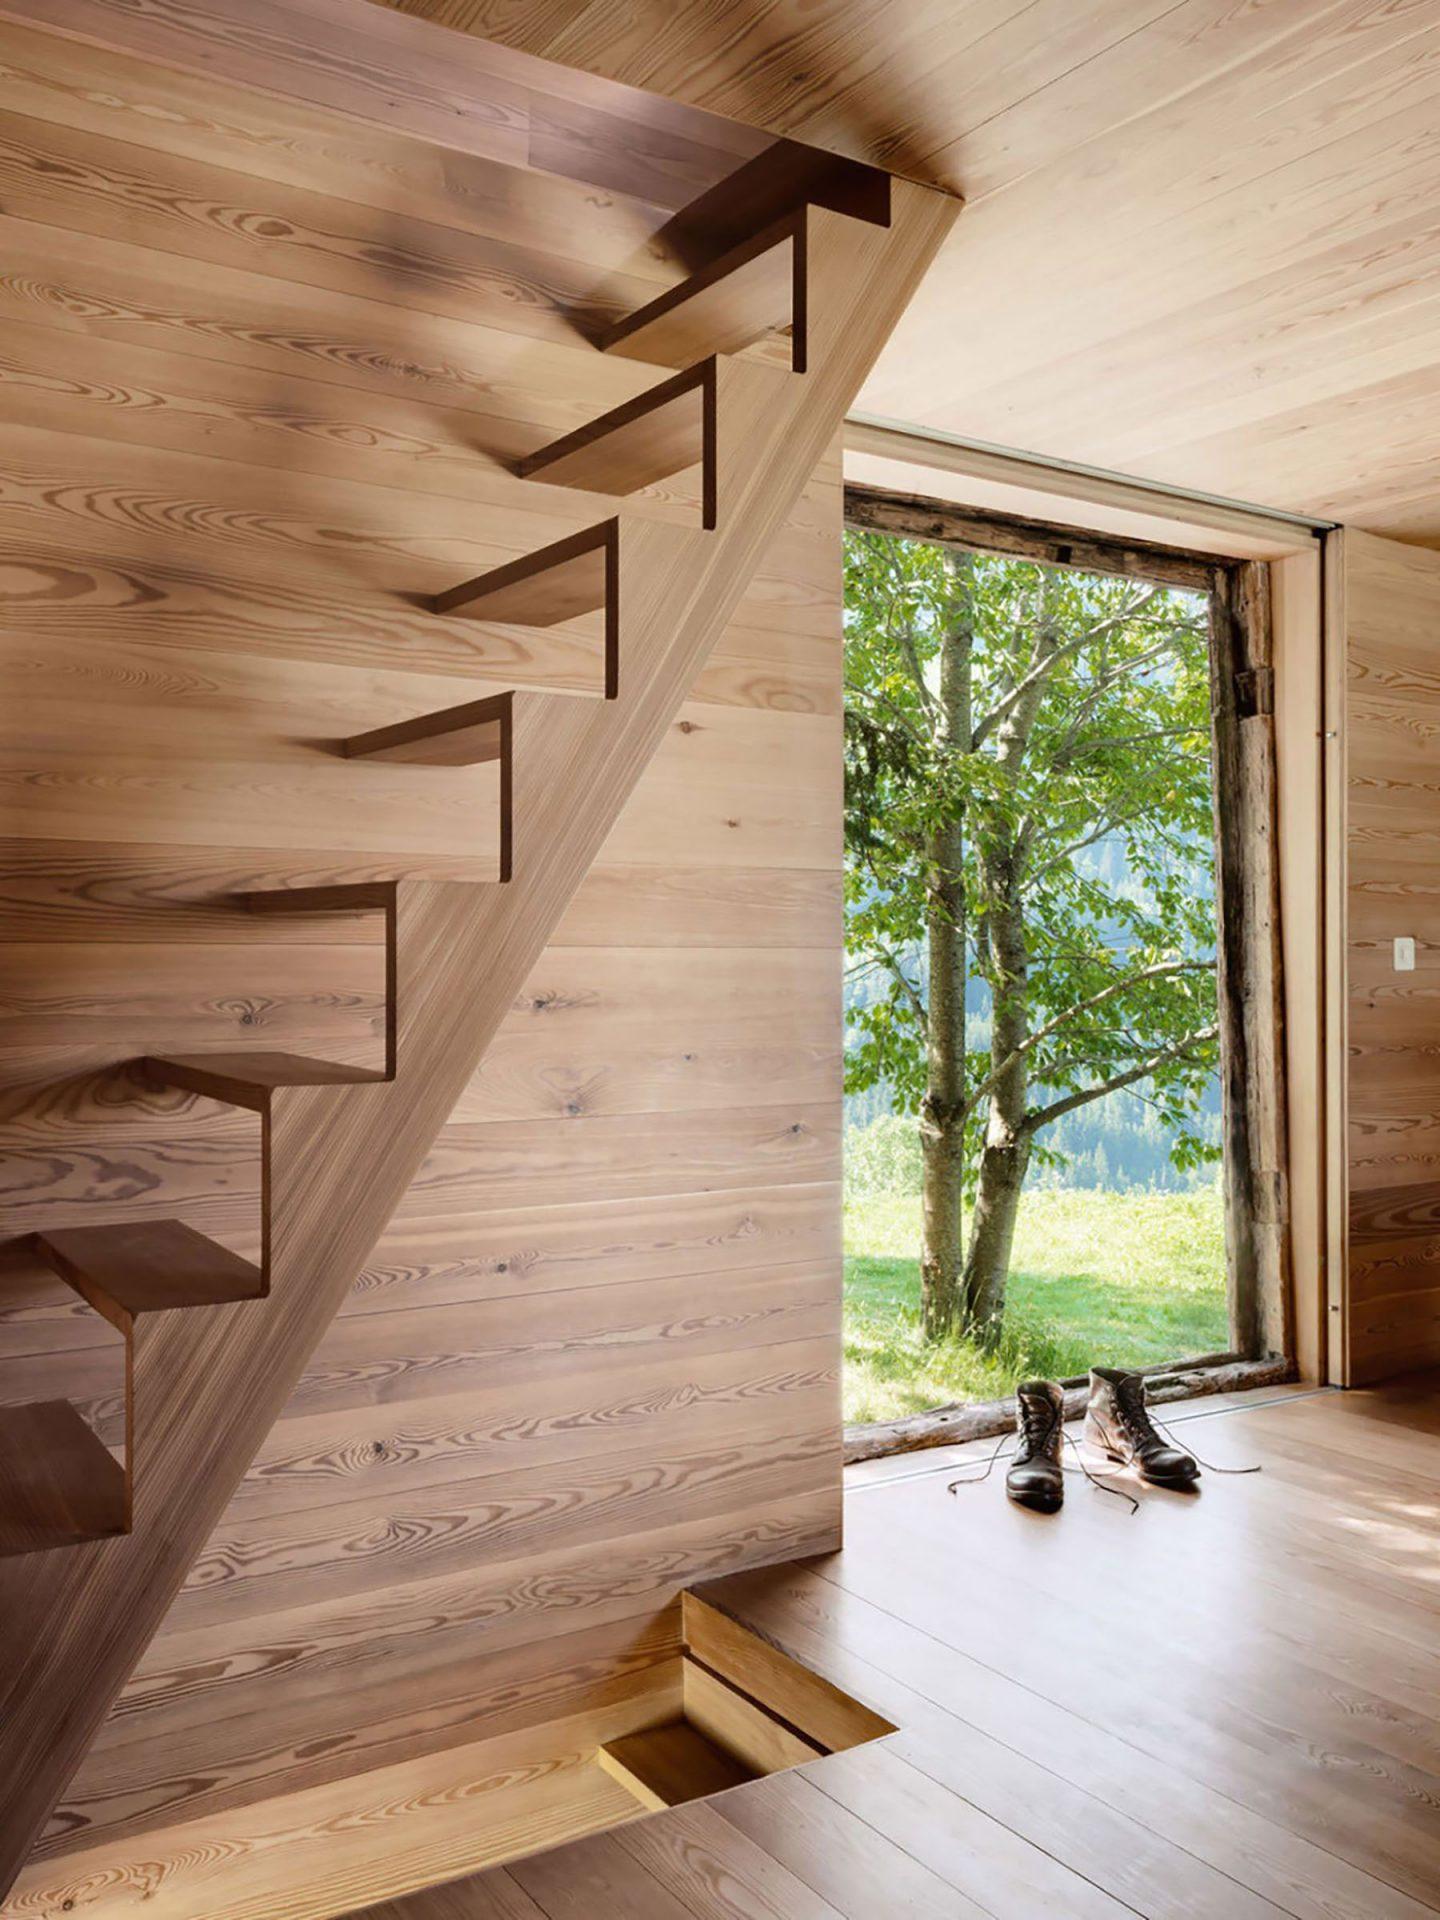 iGNANT-Architecture-Rapin-Saiz-Sarreyer-Cabin-13